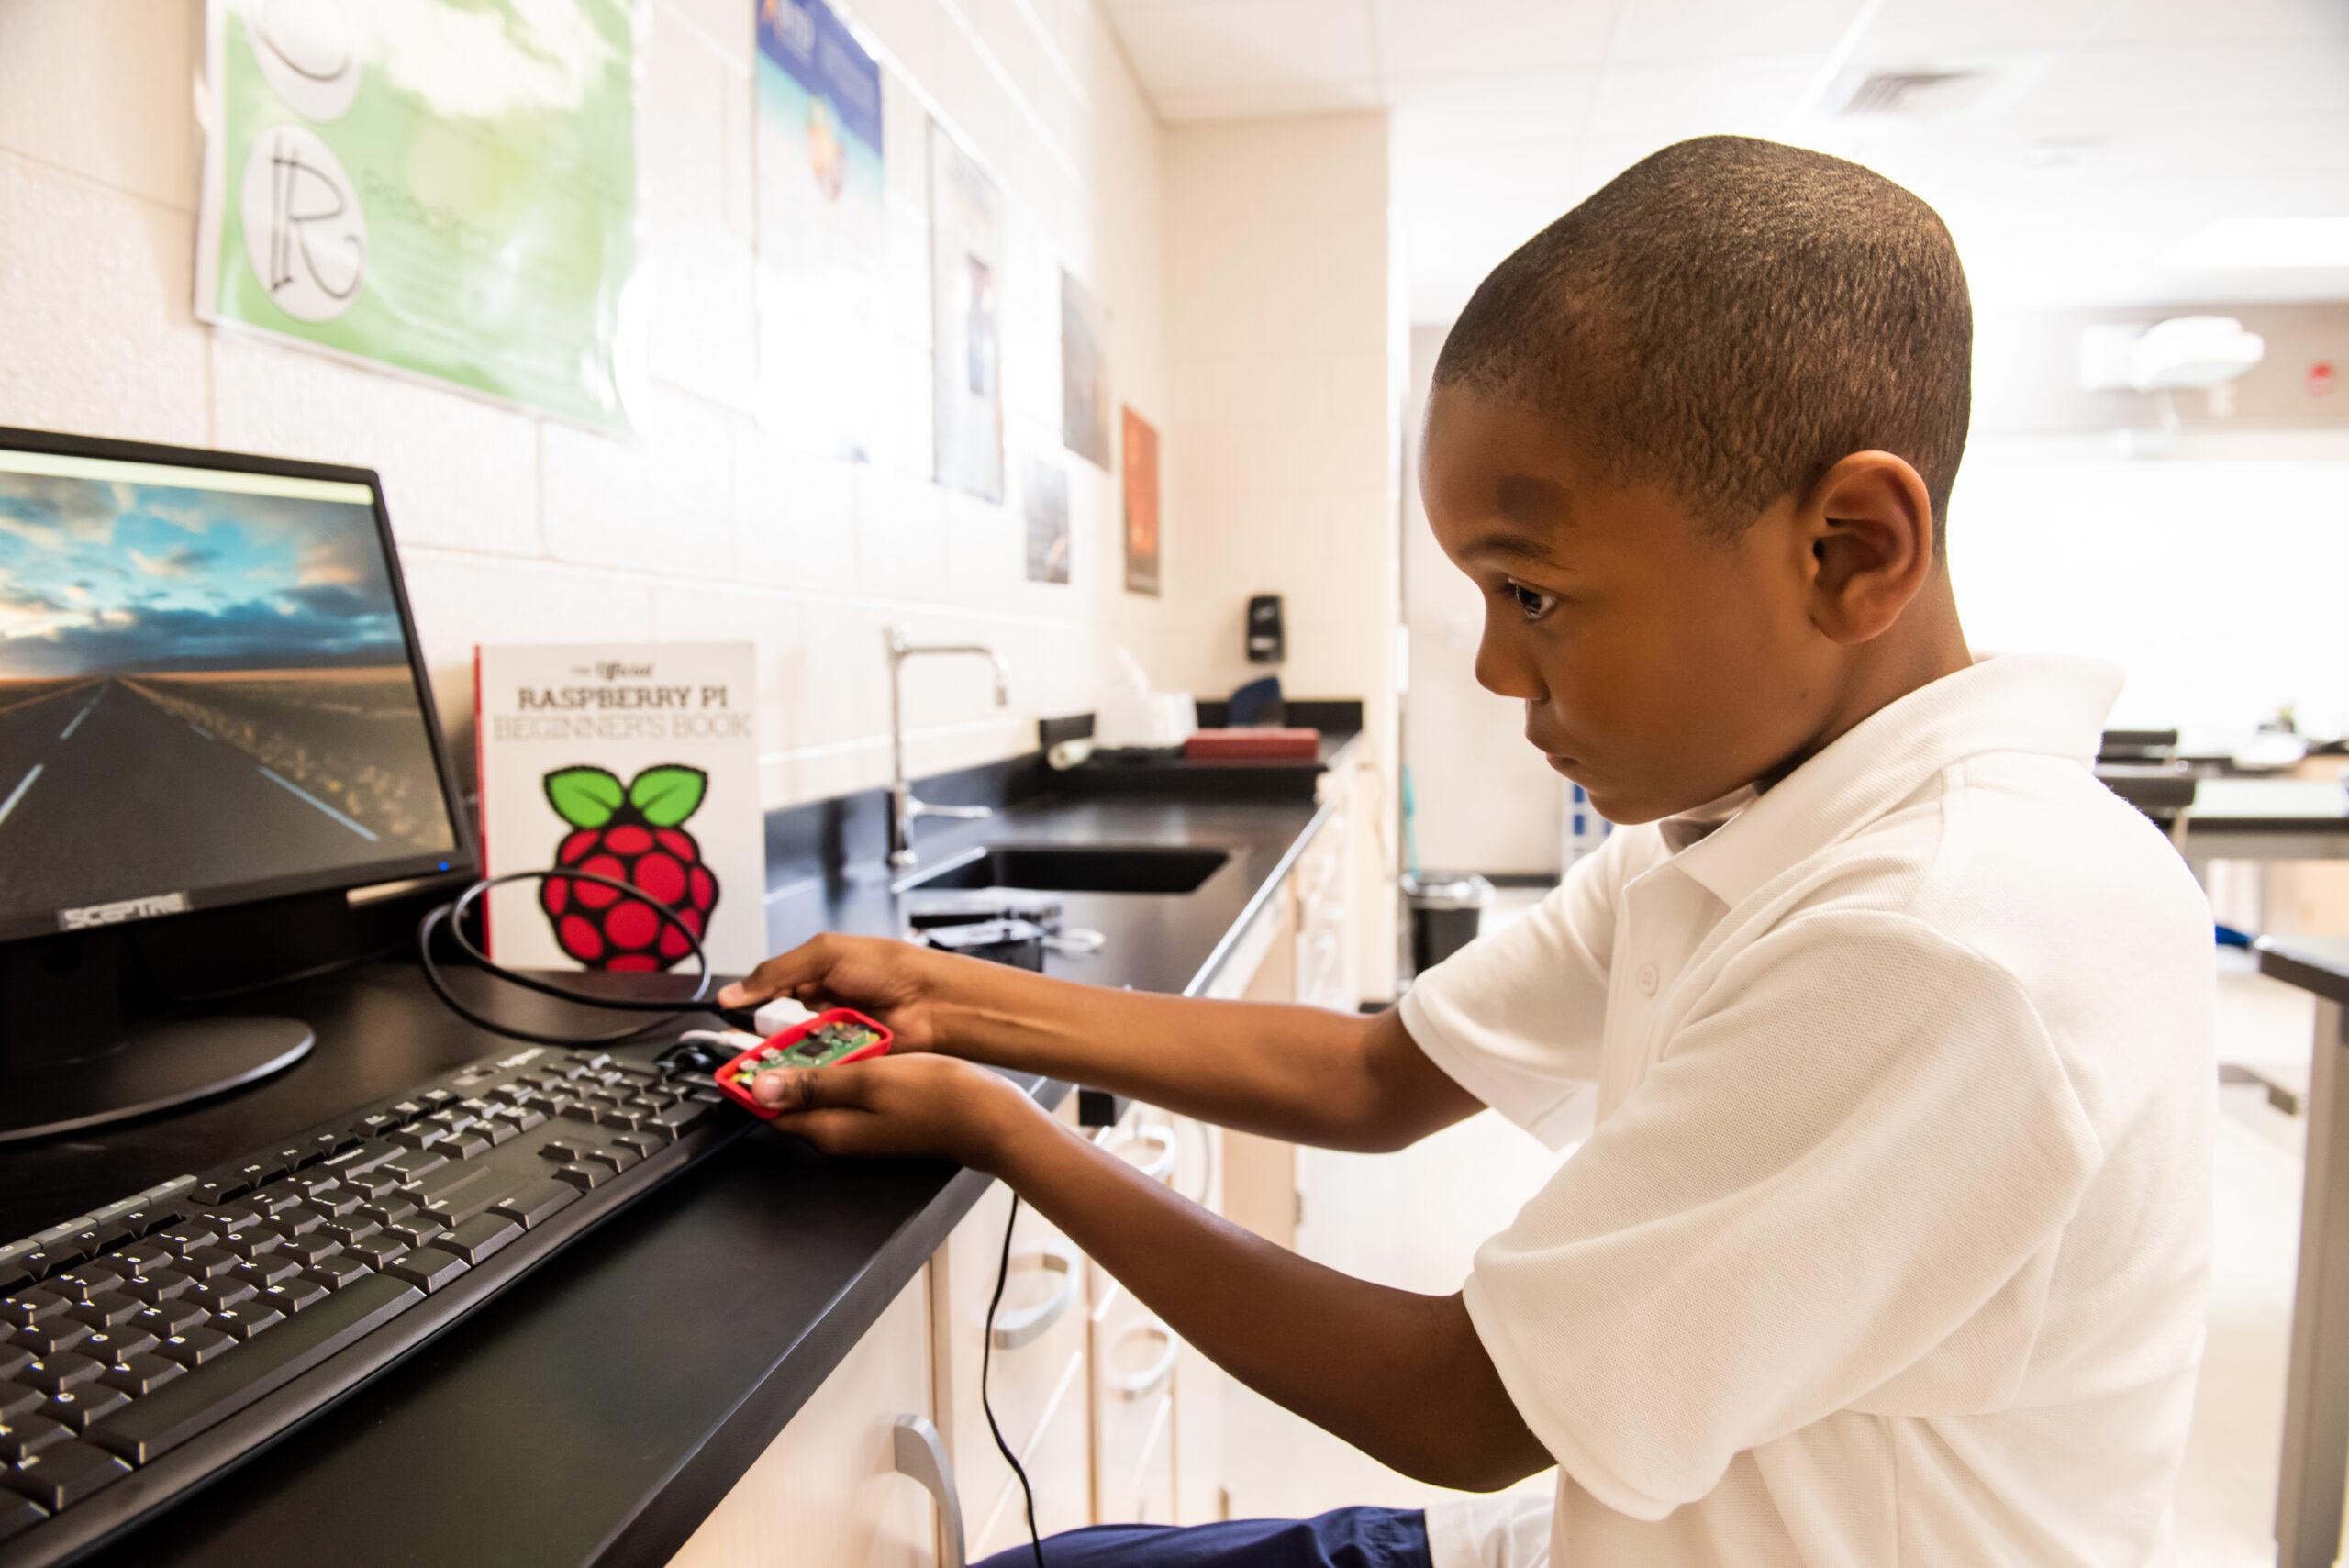 A Black boy uses a Raspberry Pi computer at school.